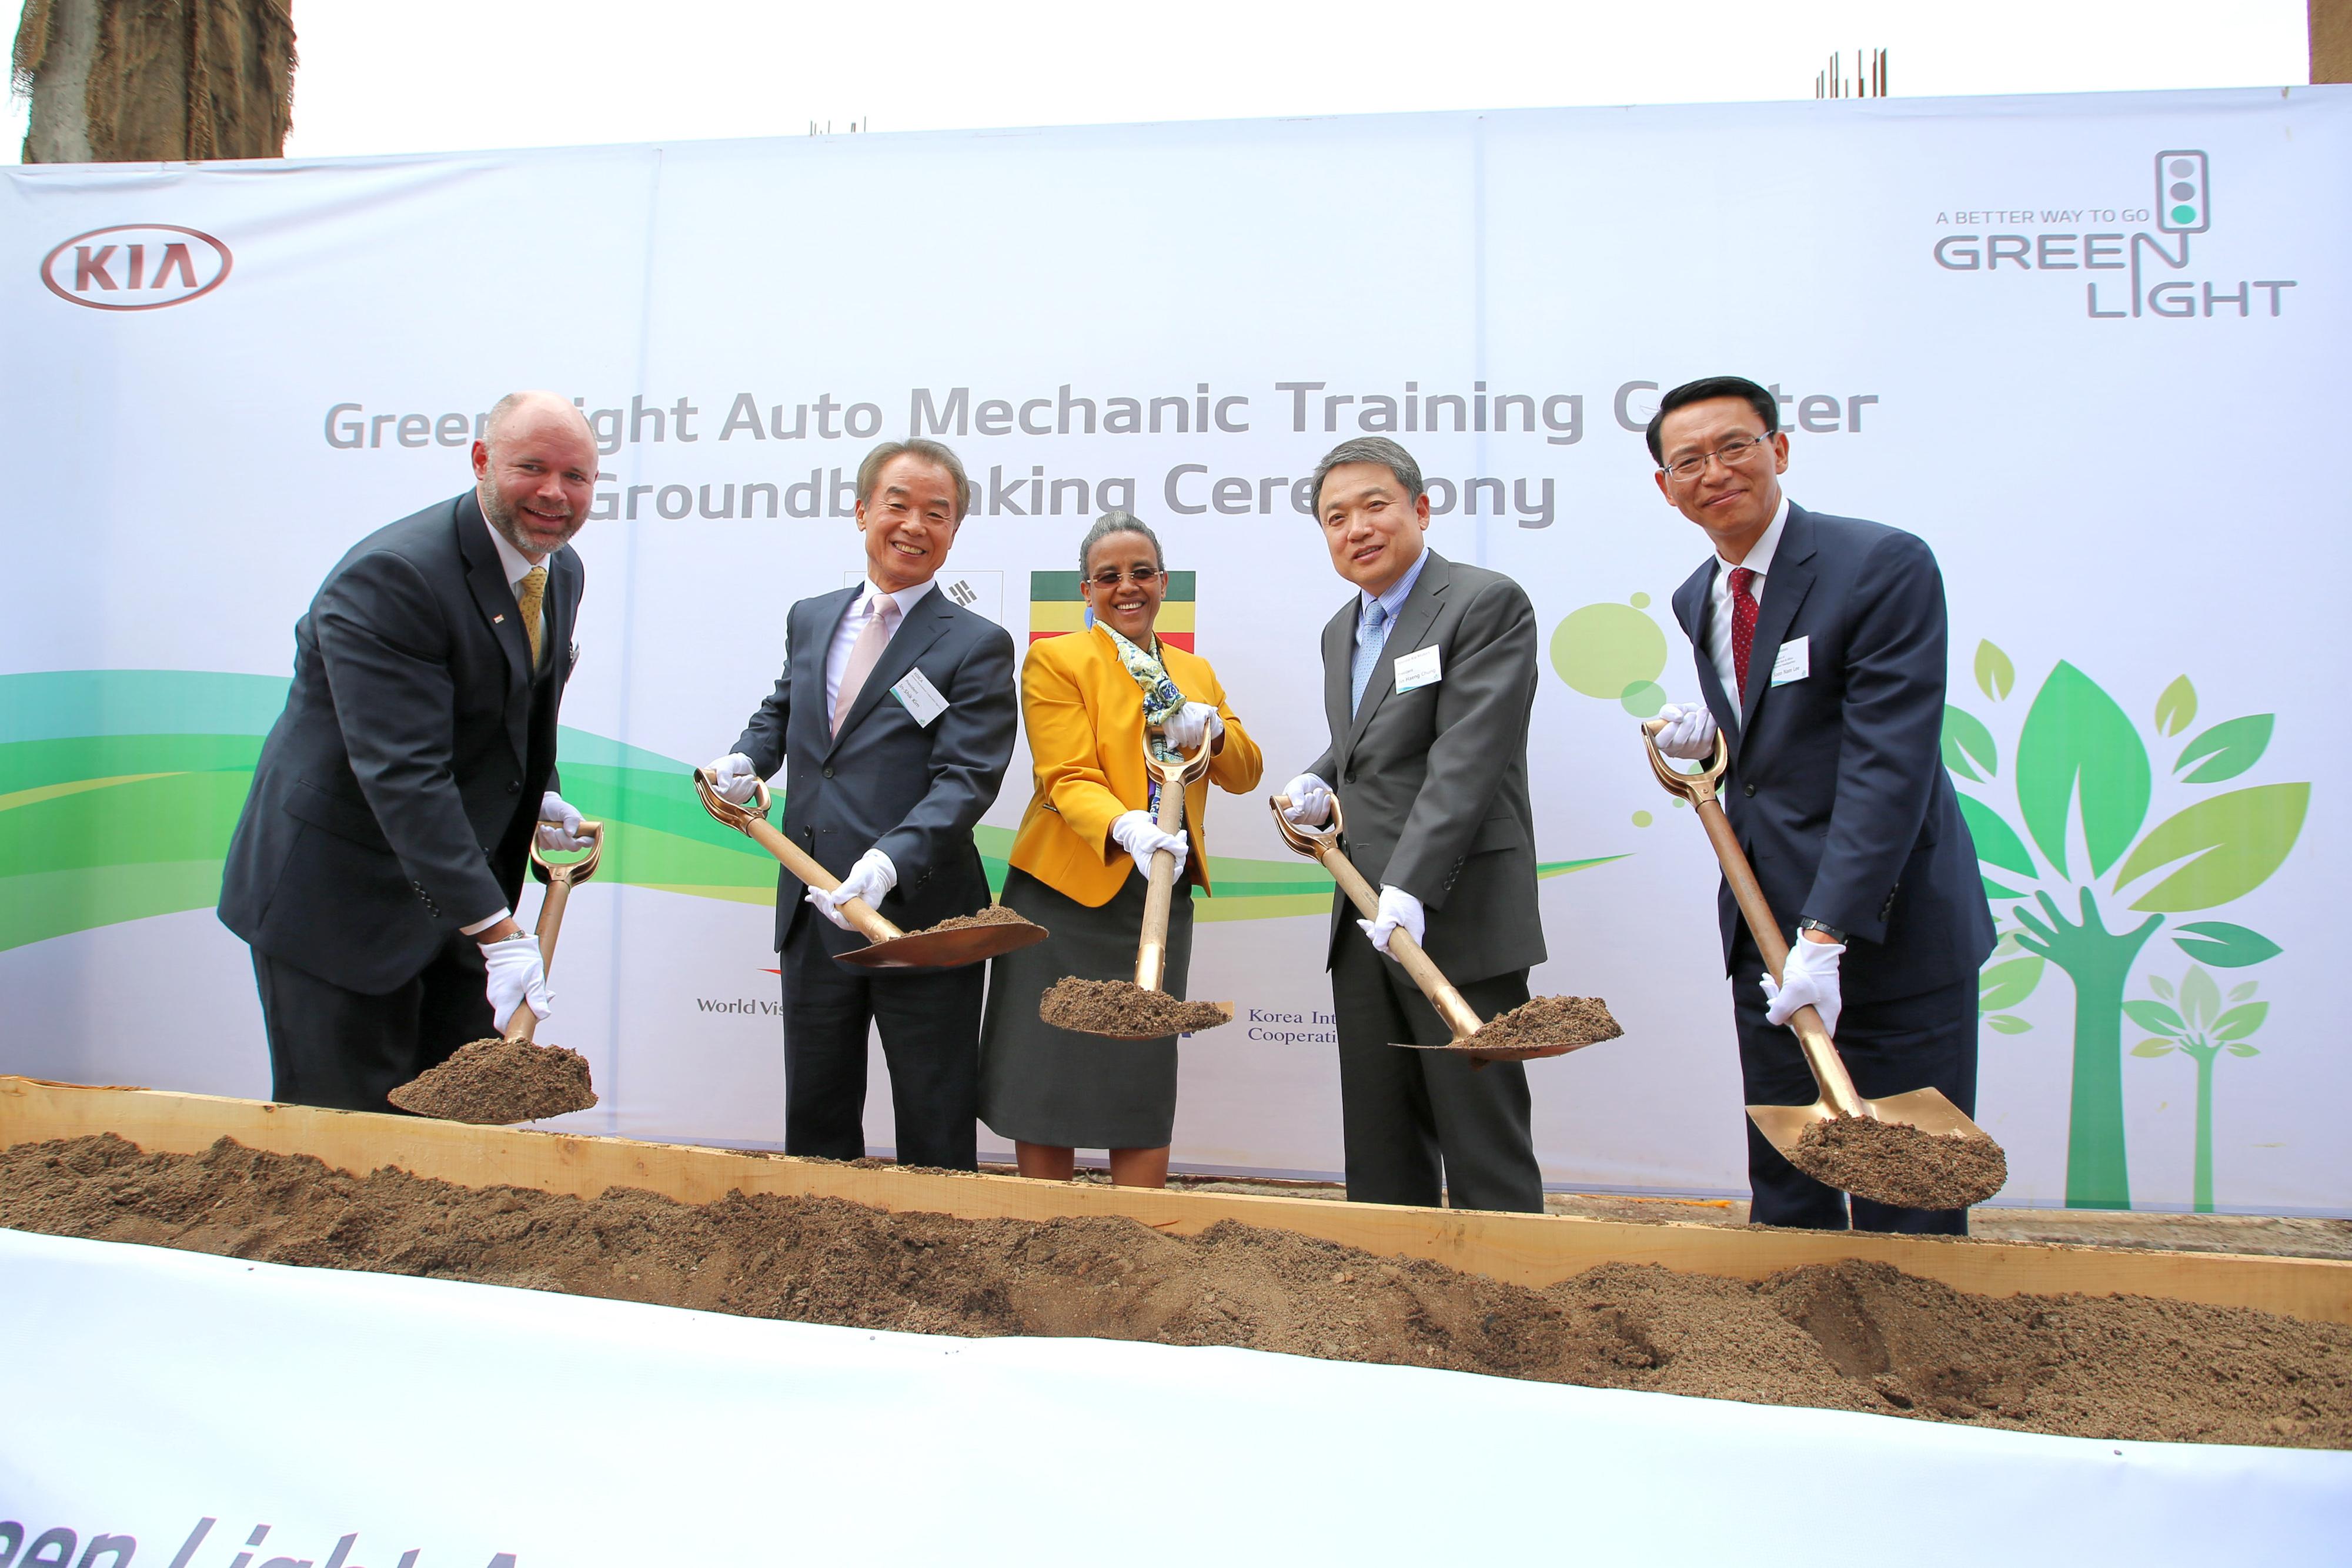 Kia Motors backs creation of community auto mechanic training centers in Ethiopia and Kenya